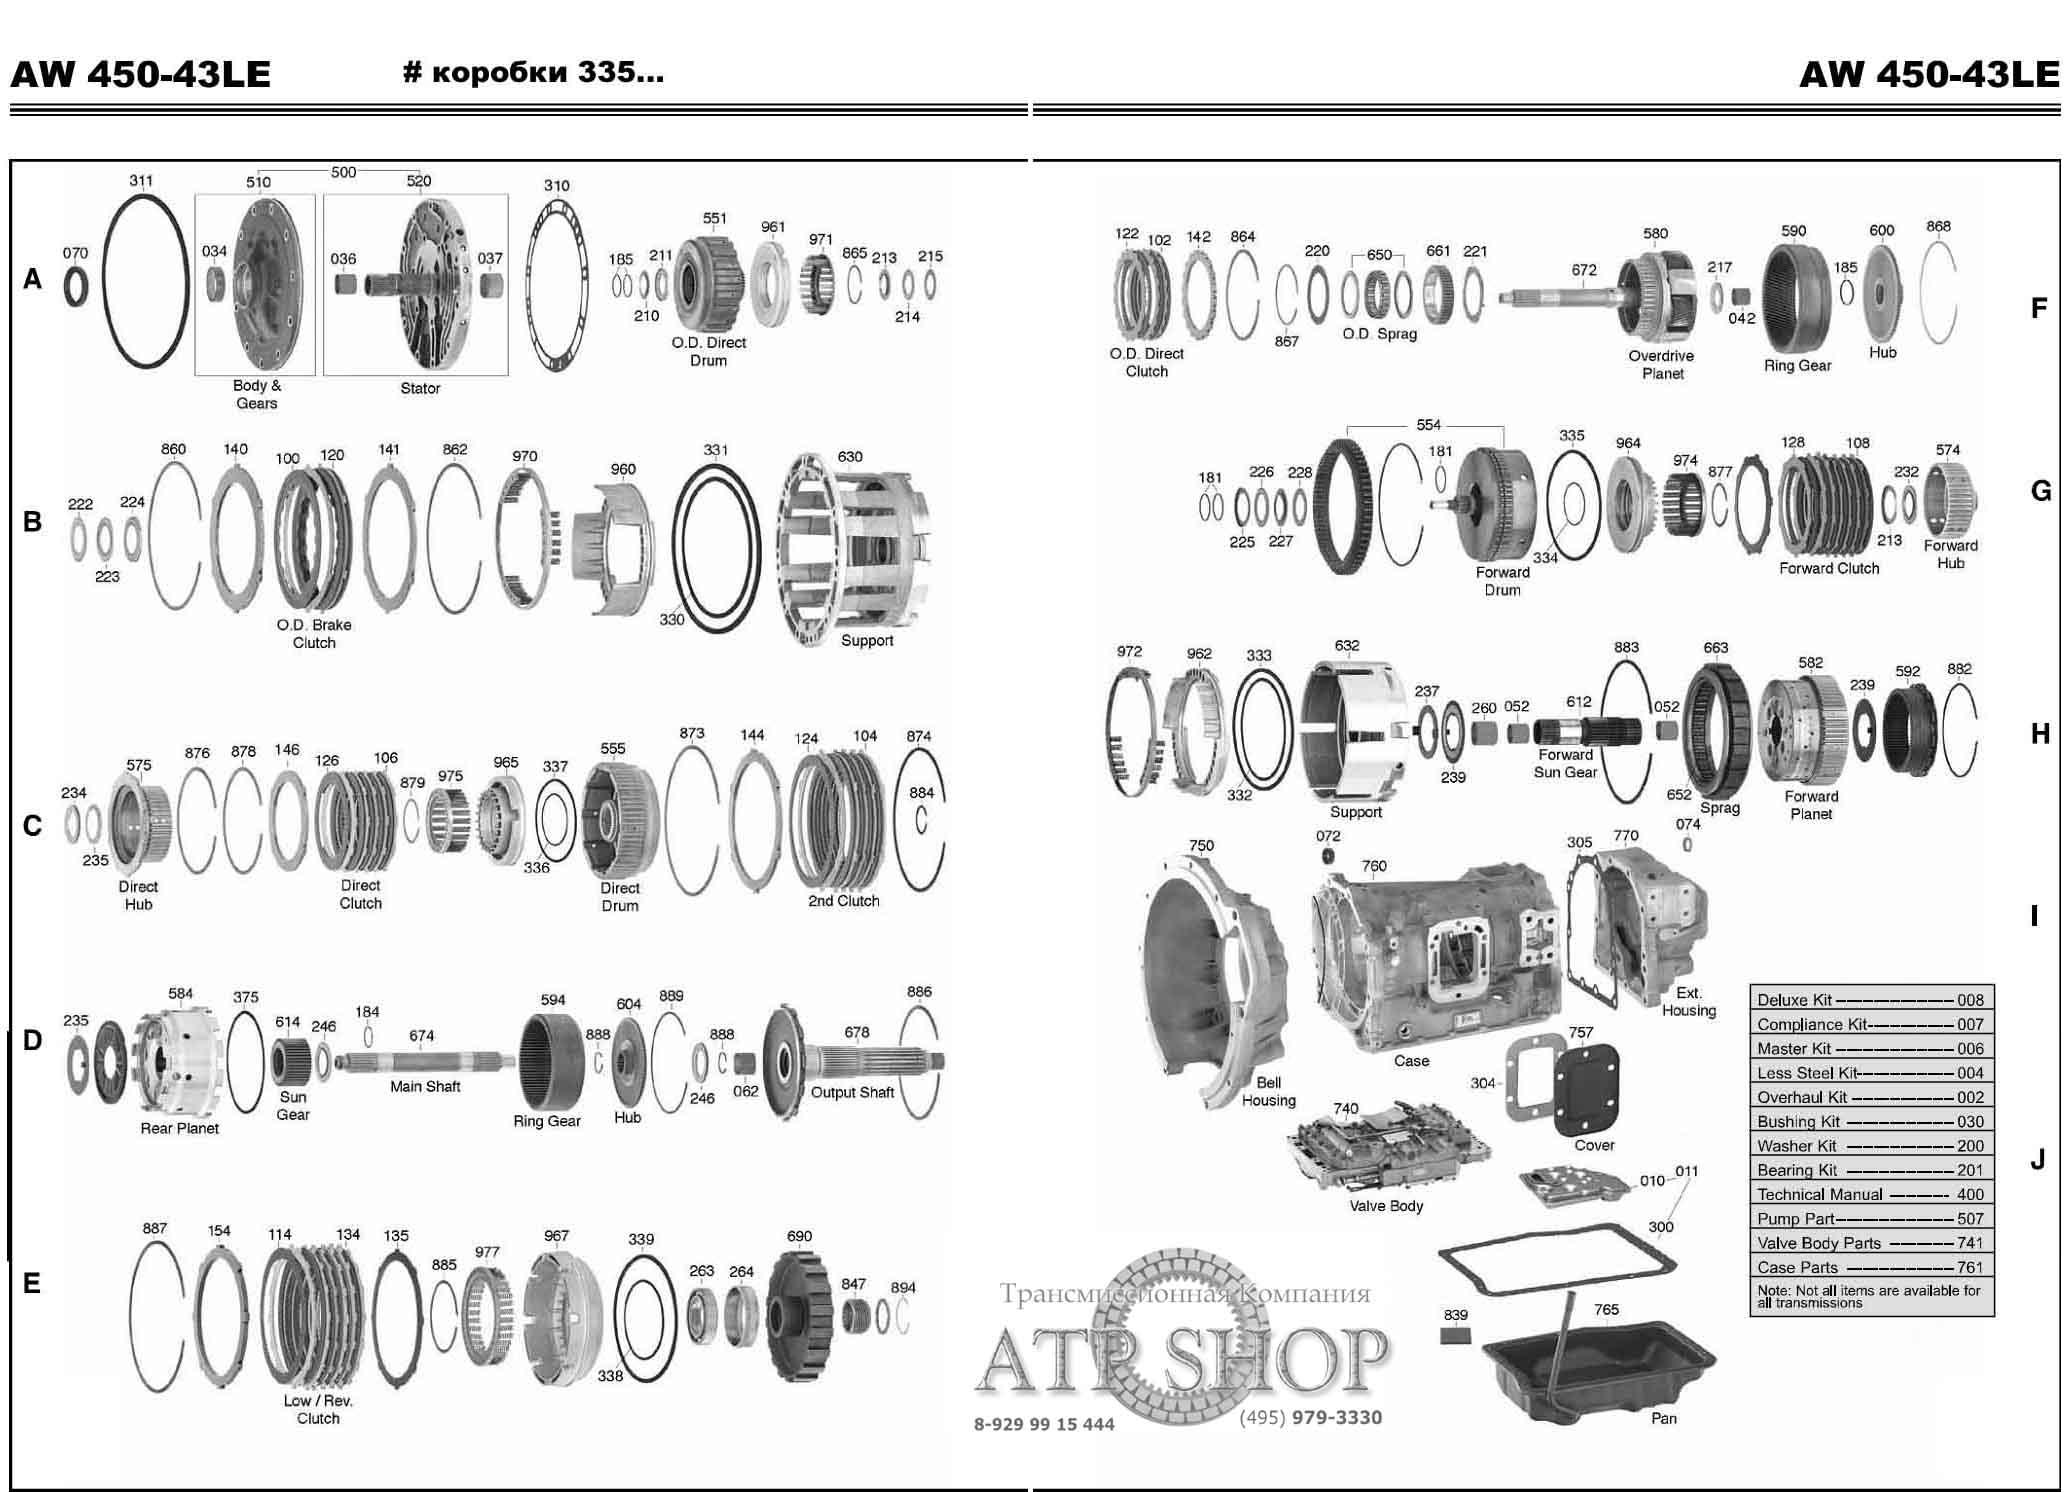 Aw450